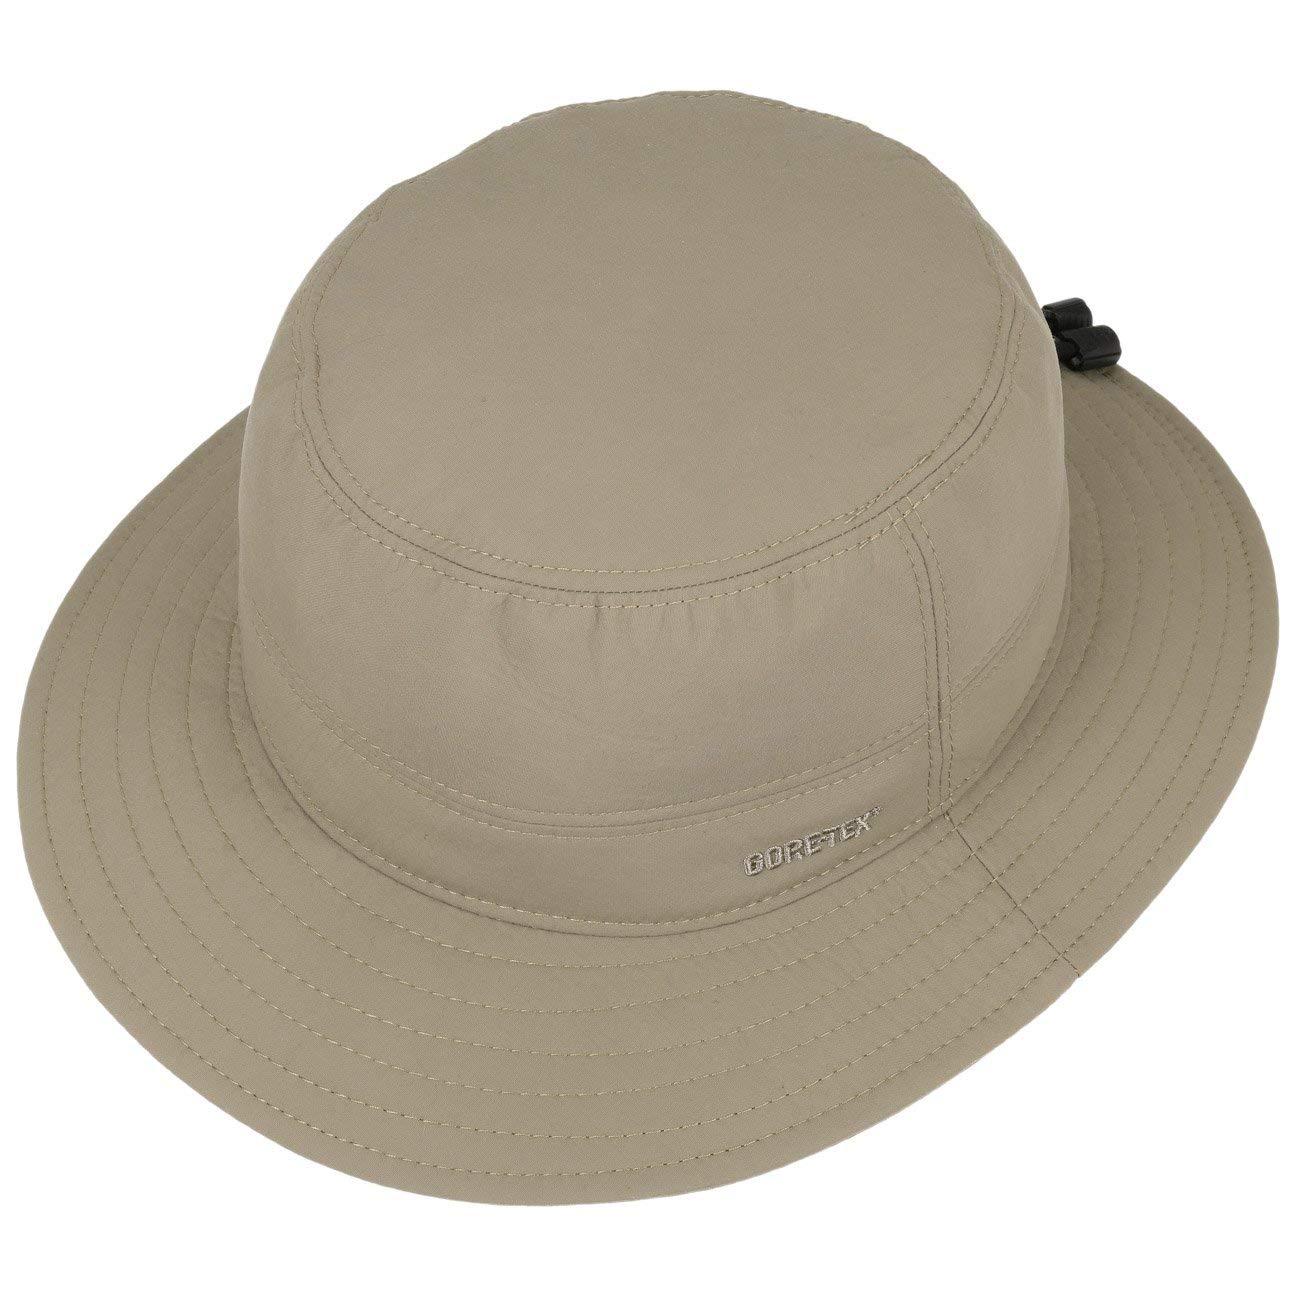 97fc44dc165d6 Lierys Gore-Tex Bucket Rain Hat Outdoor (XL (60-61 cm) - Light Olive)   Amazon.co.uk  Clothing